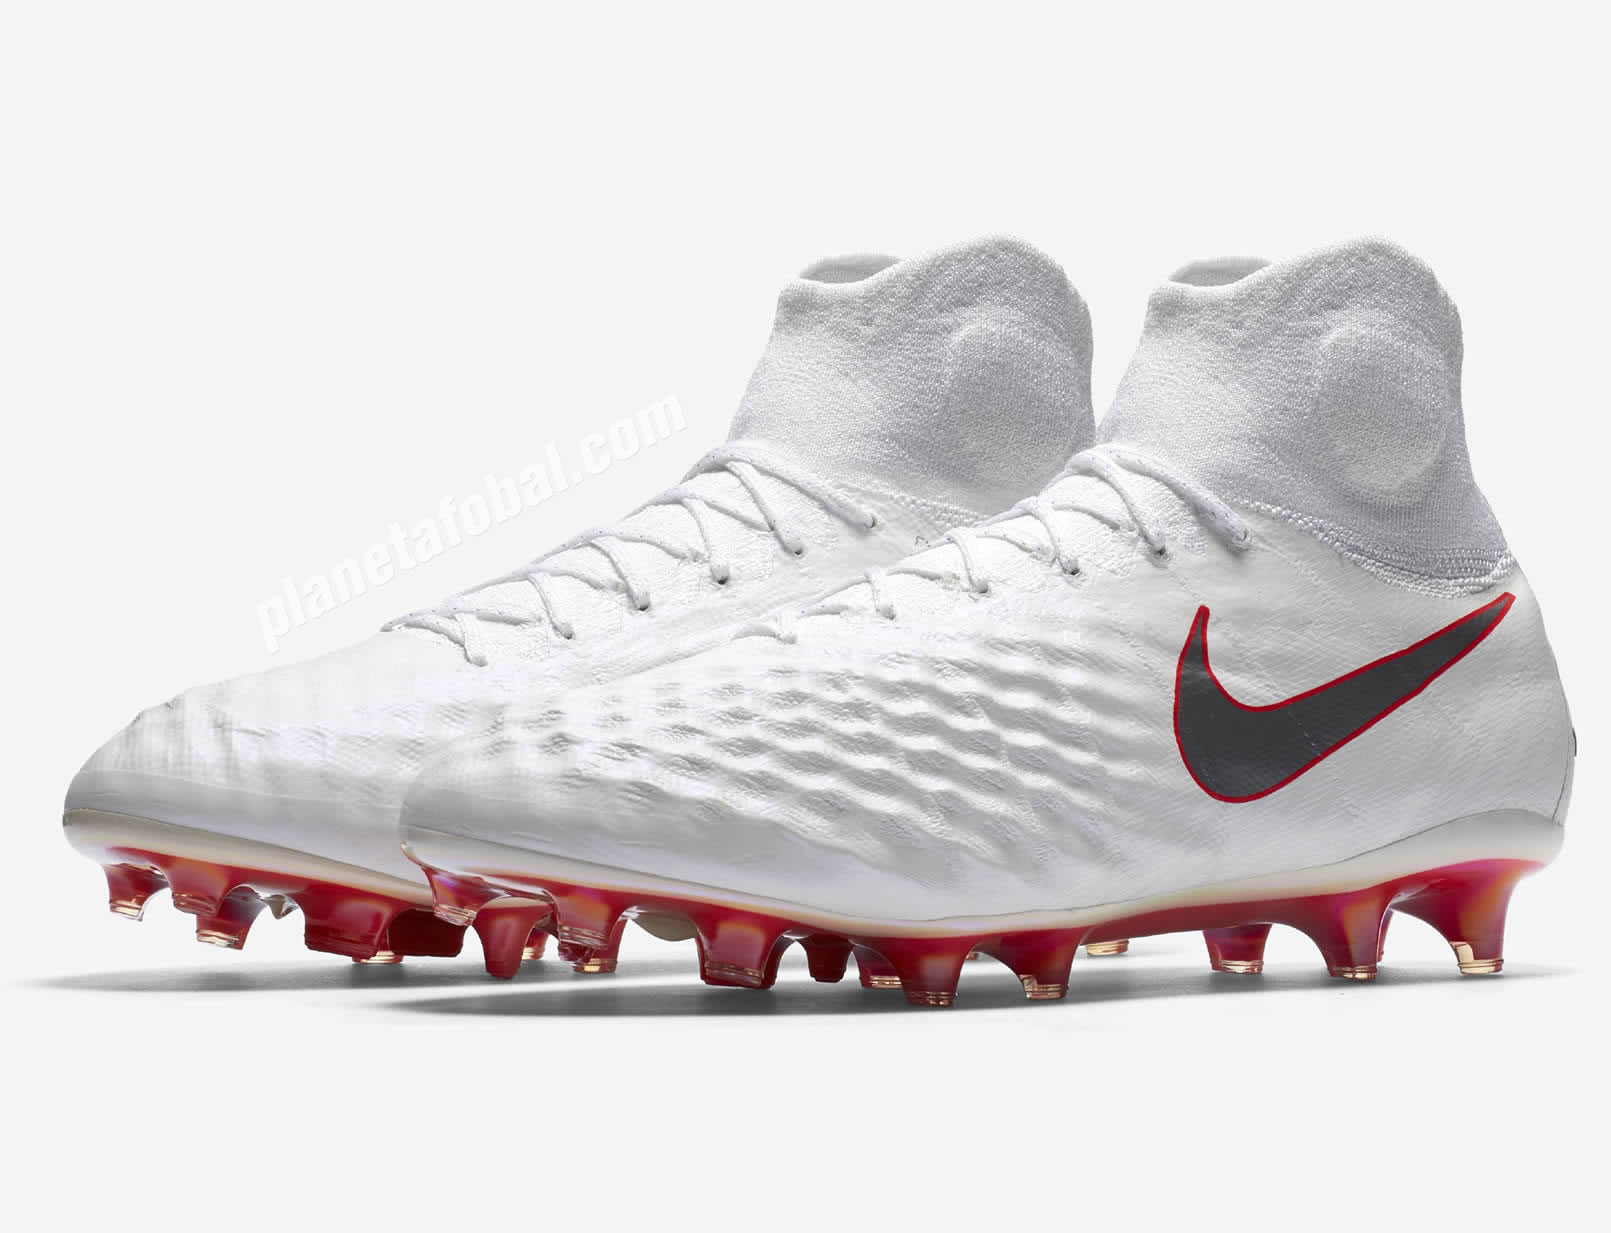 Mostrarte tubo Chelín  Colección de botines Nike para el Mundial de Rusia 2018